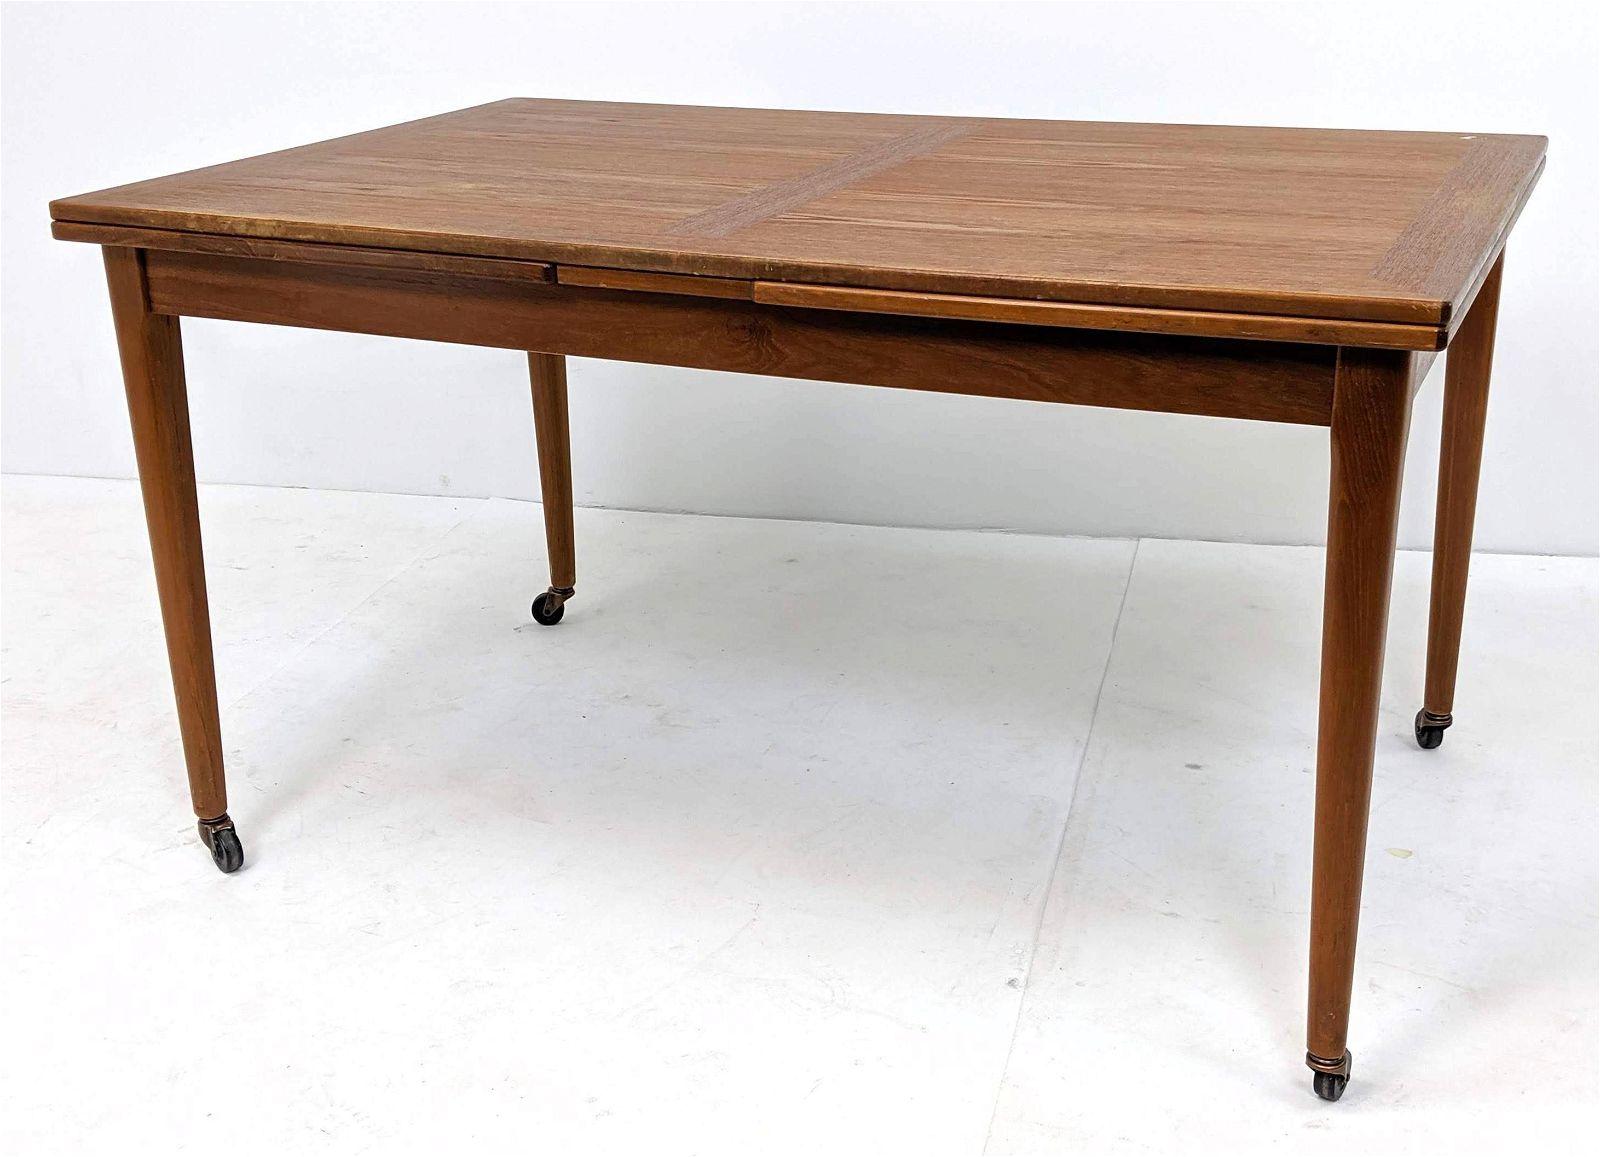 SKOVBY Danish Modern Teak Refractory Dining Table. Tape